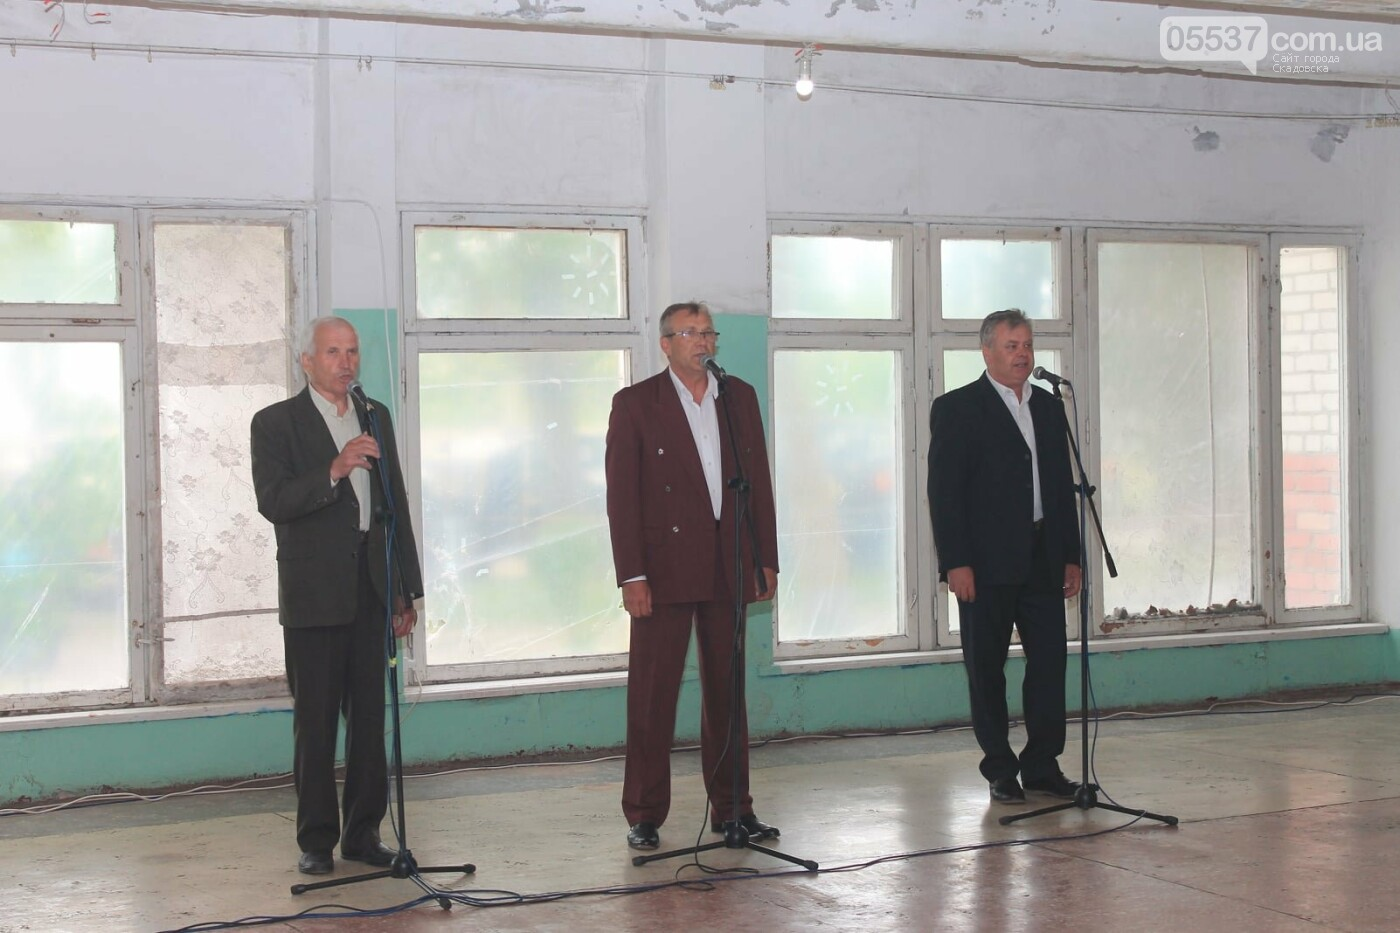 В Скадовском районе морских пехотинцев поздравляли с праздником (ФОТО), фото-2